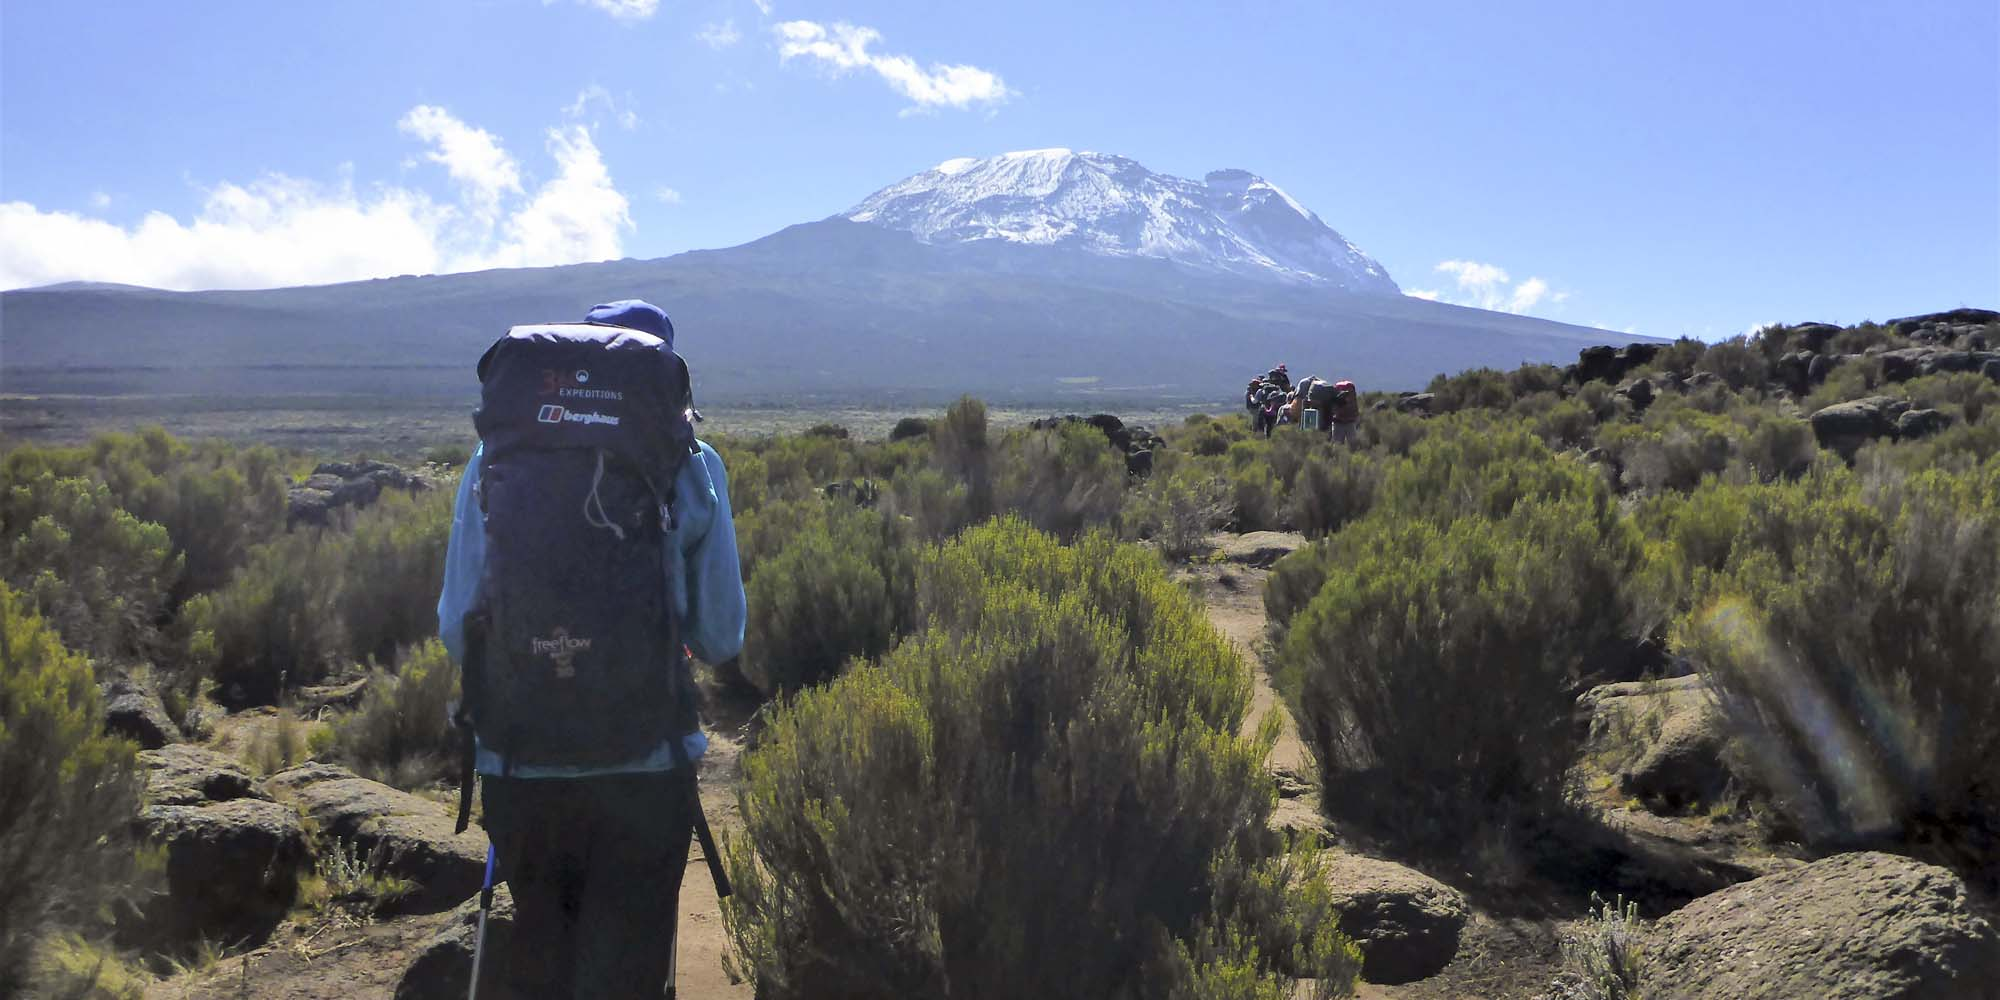 Trek Mount Kilimanjaro Lemosho Route With 360 Expeditions